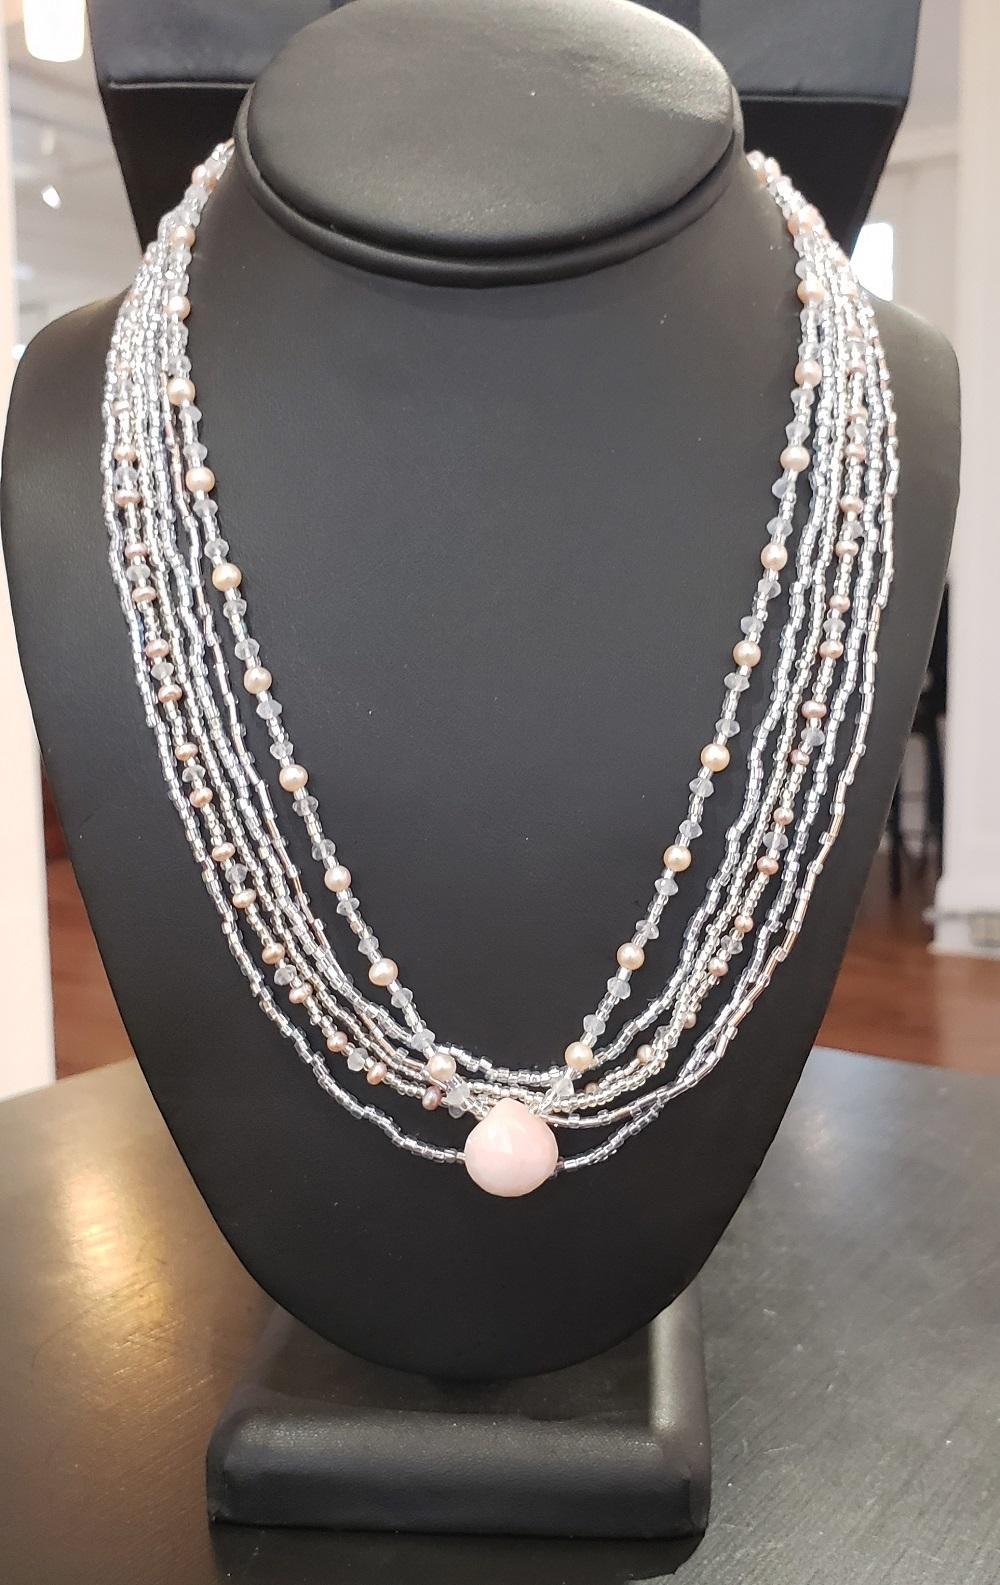 Hannah Rose ||Seraphim Pearls ||$125